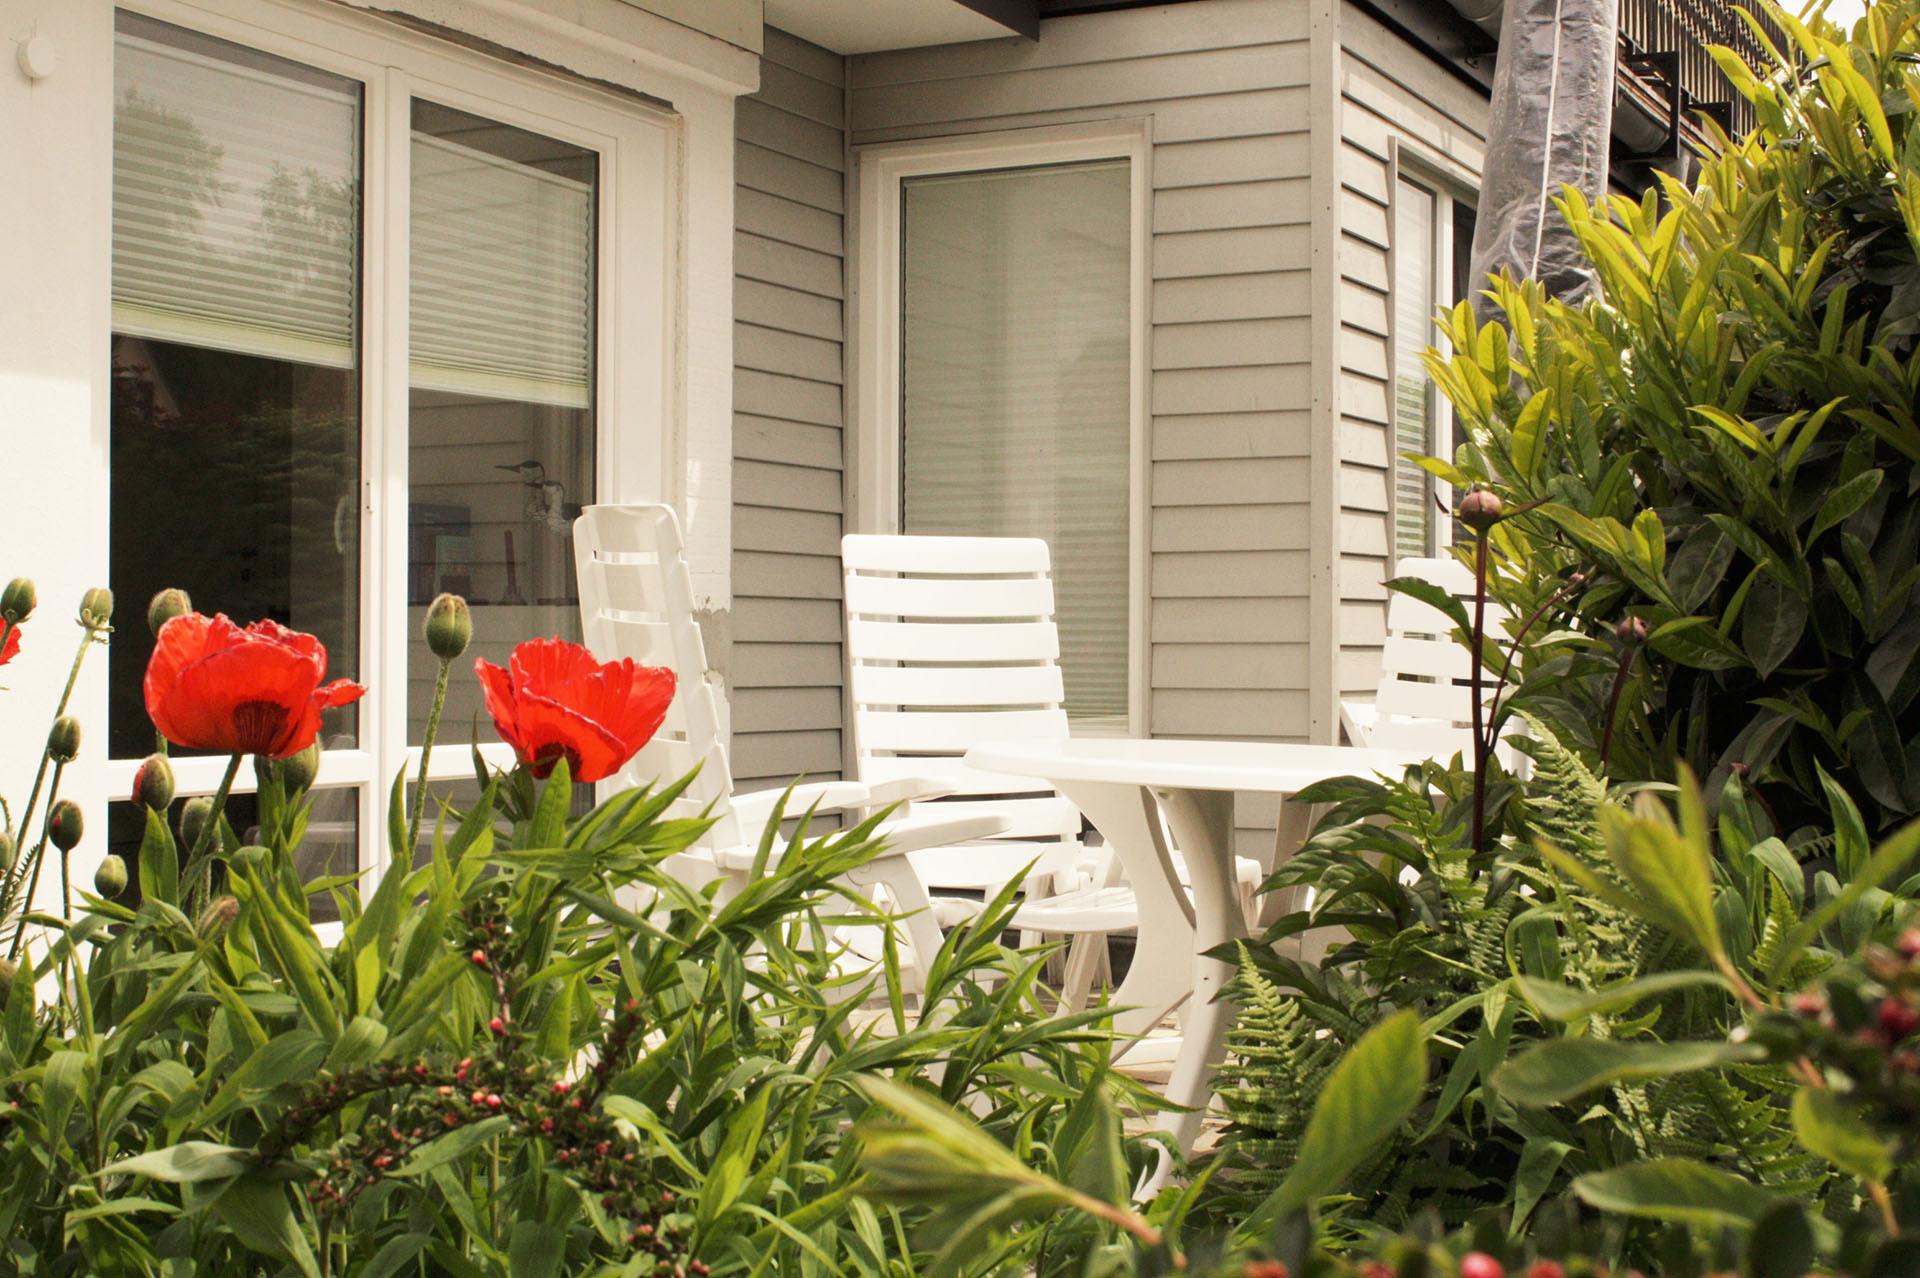 malerhaus-kuhse-ferienwohnung-klatschmohn-terrasse